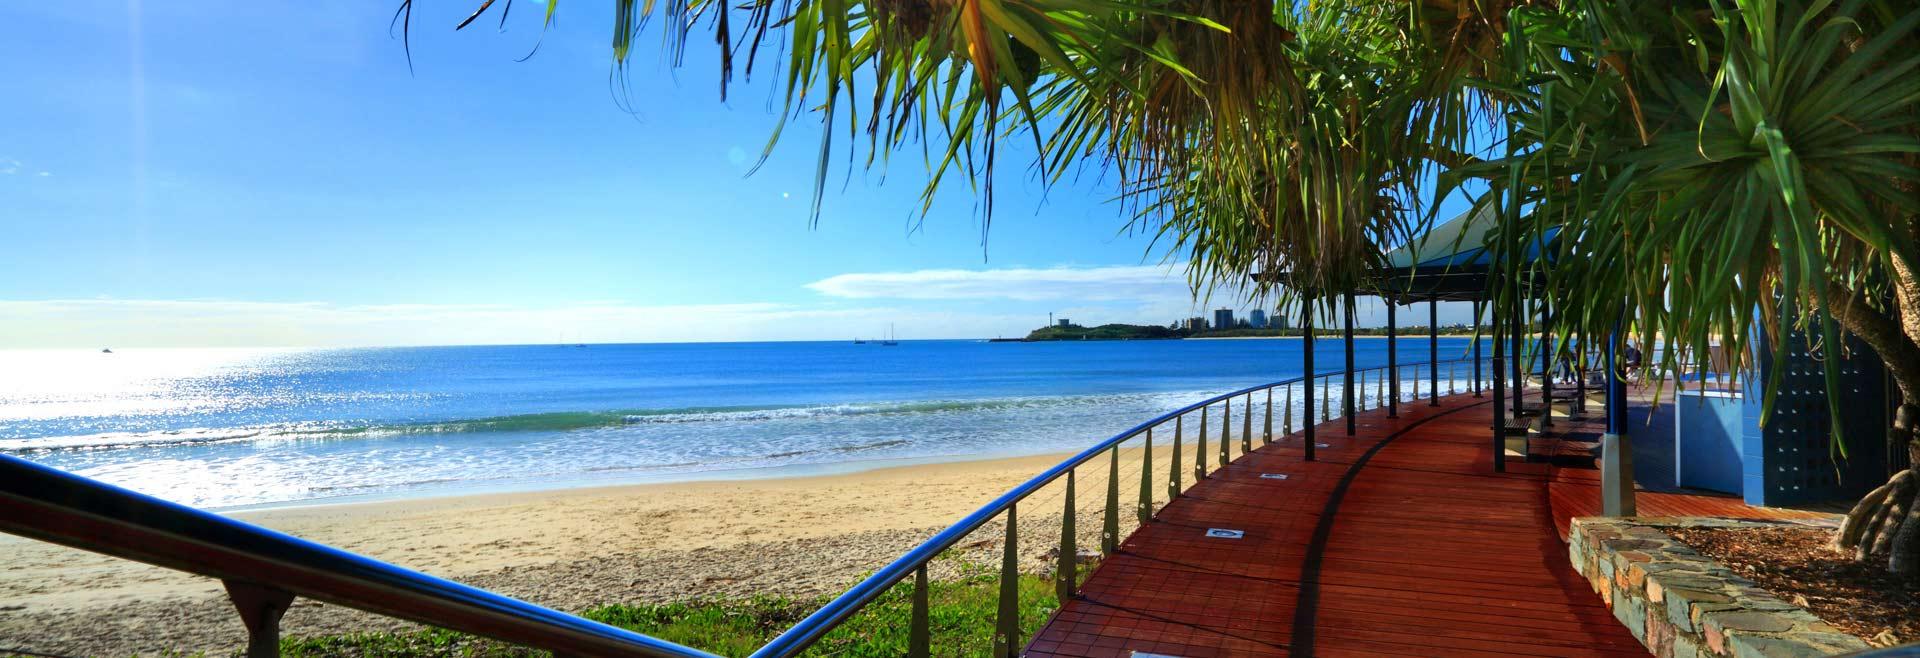 Mooloolaba-Beach.jpg